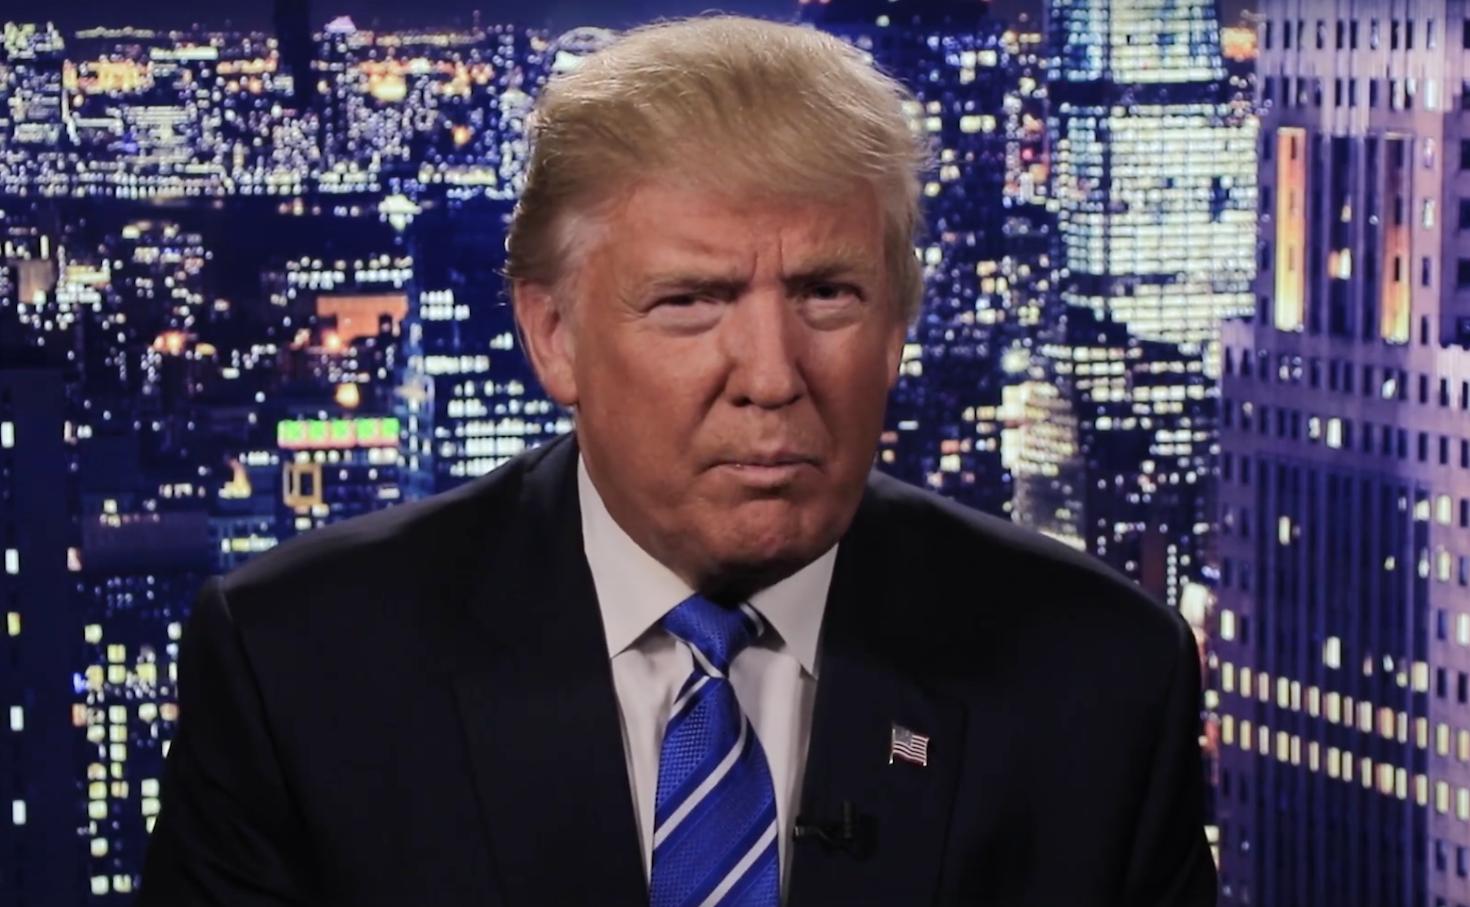 donald trump apology statement